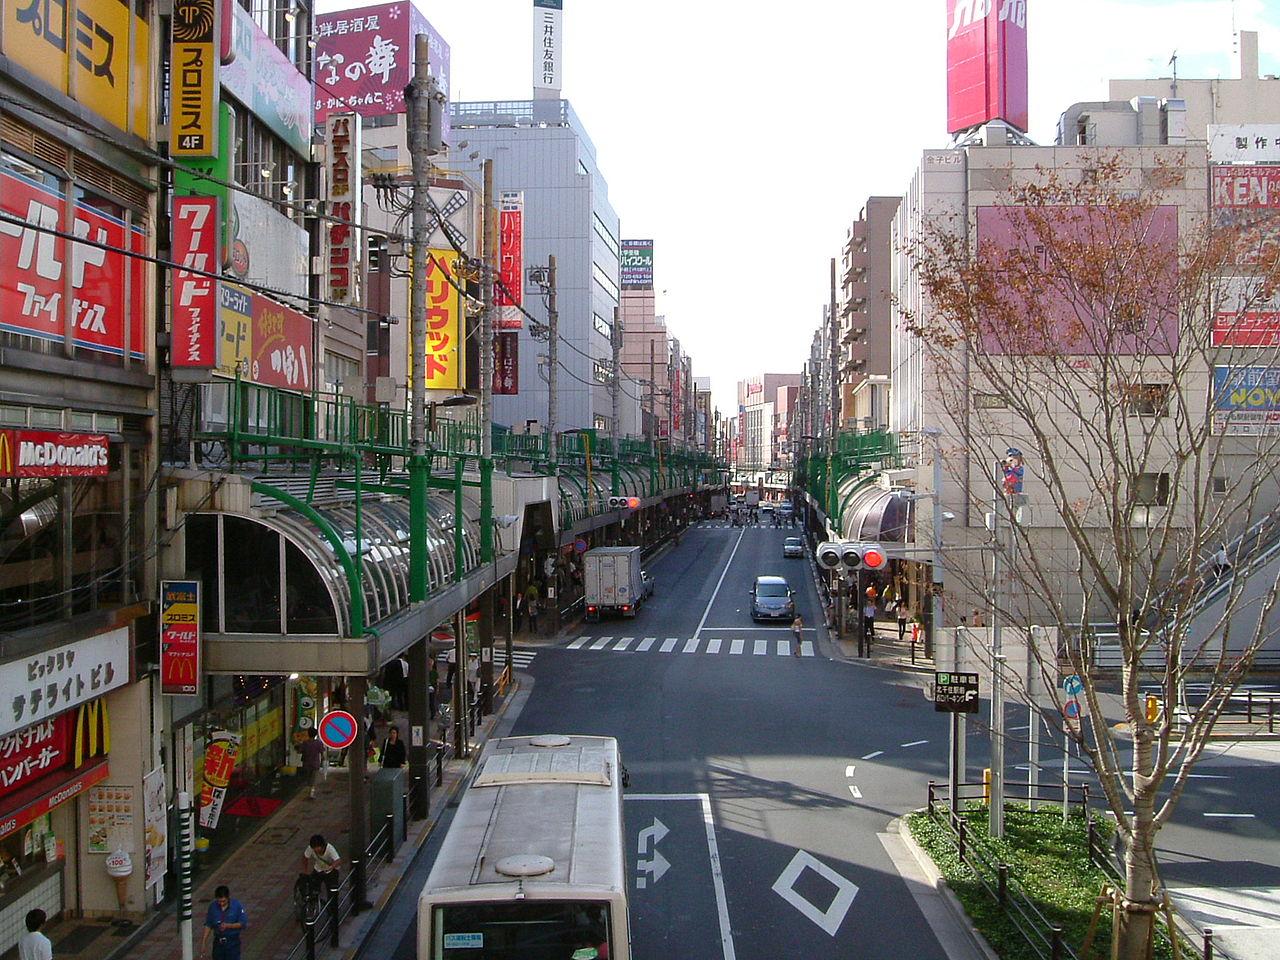 1280px-Kitasenju_station_west_side_scene.jpg